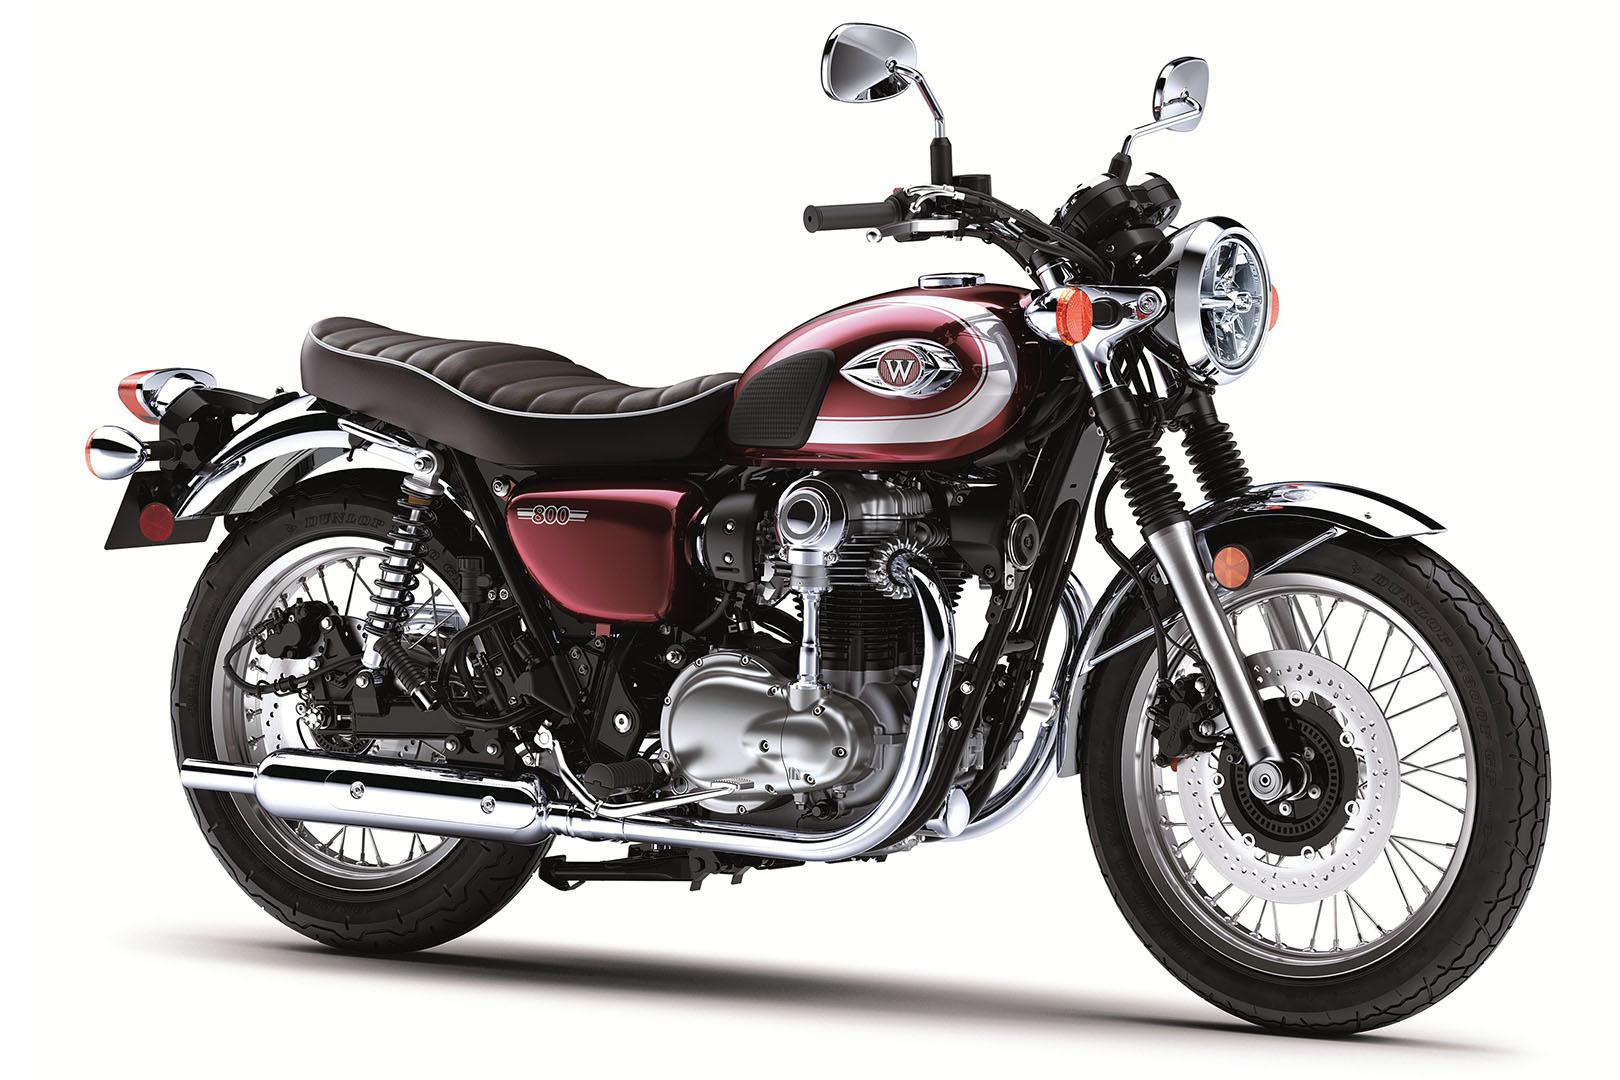 2020 Kawasaki W800 First Ride Review - MSRP